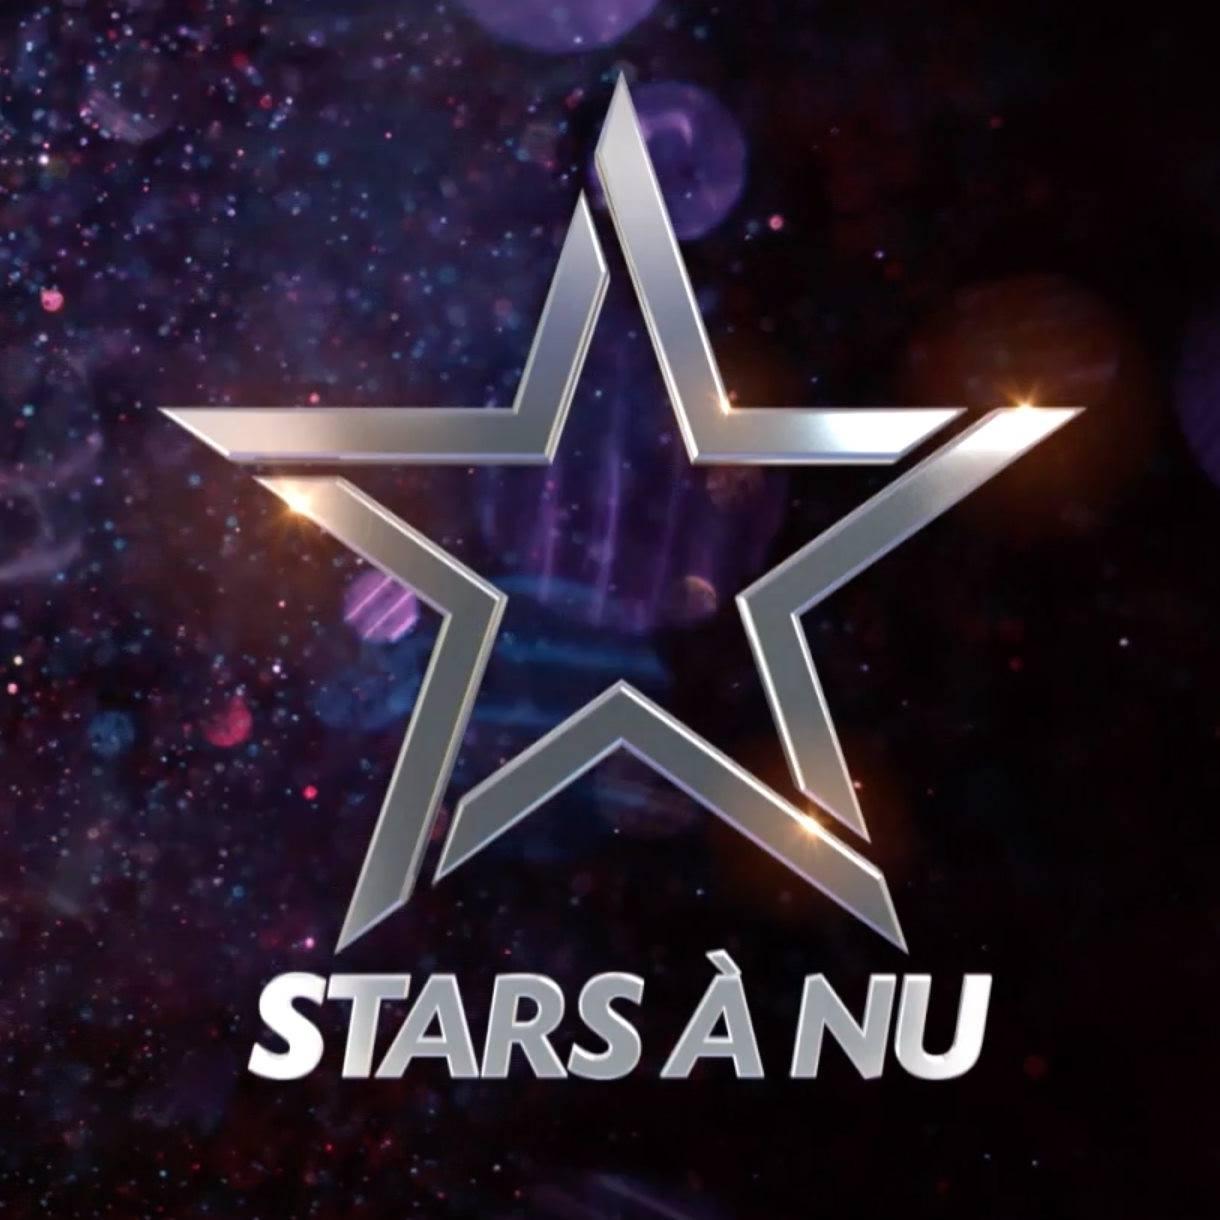 Stars à nu - TF1 - Hommes - femmes - debrief